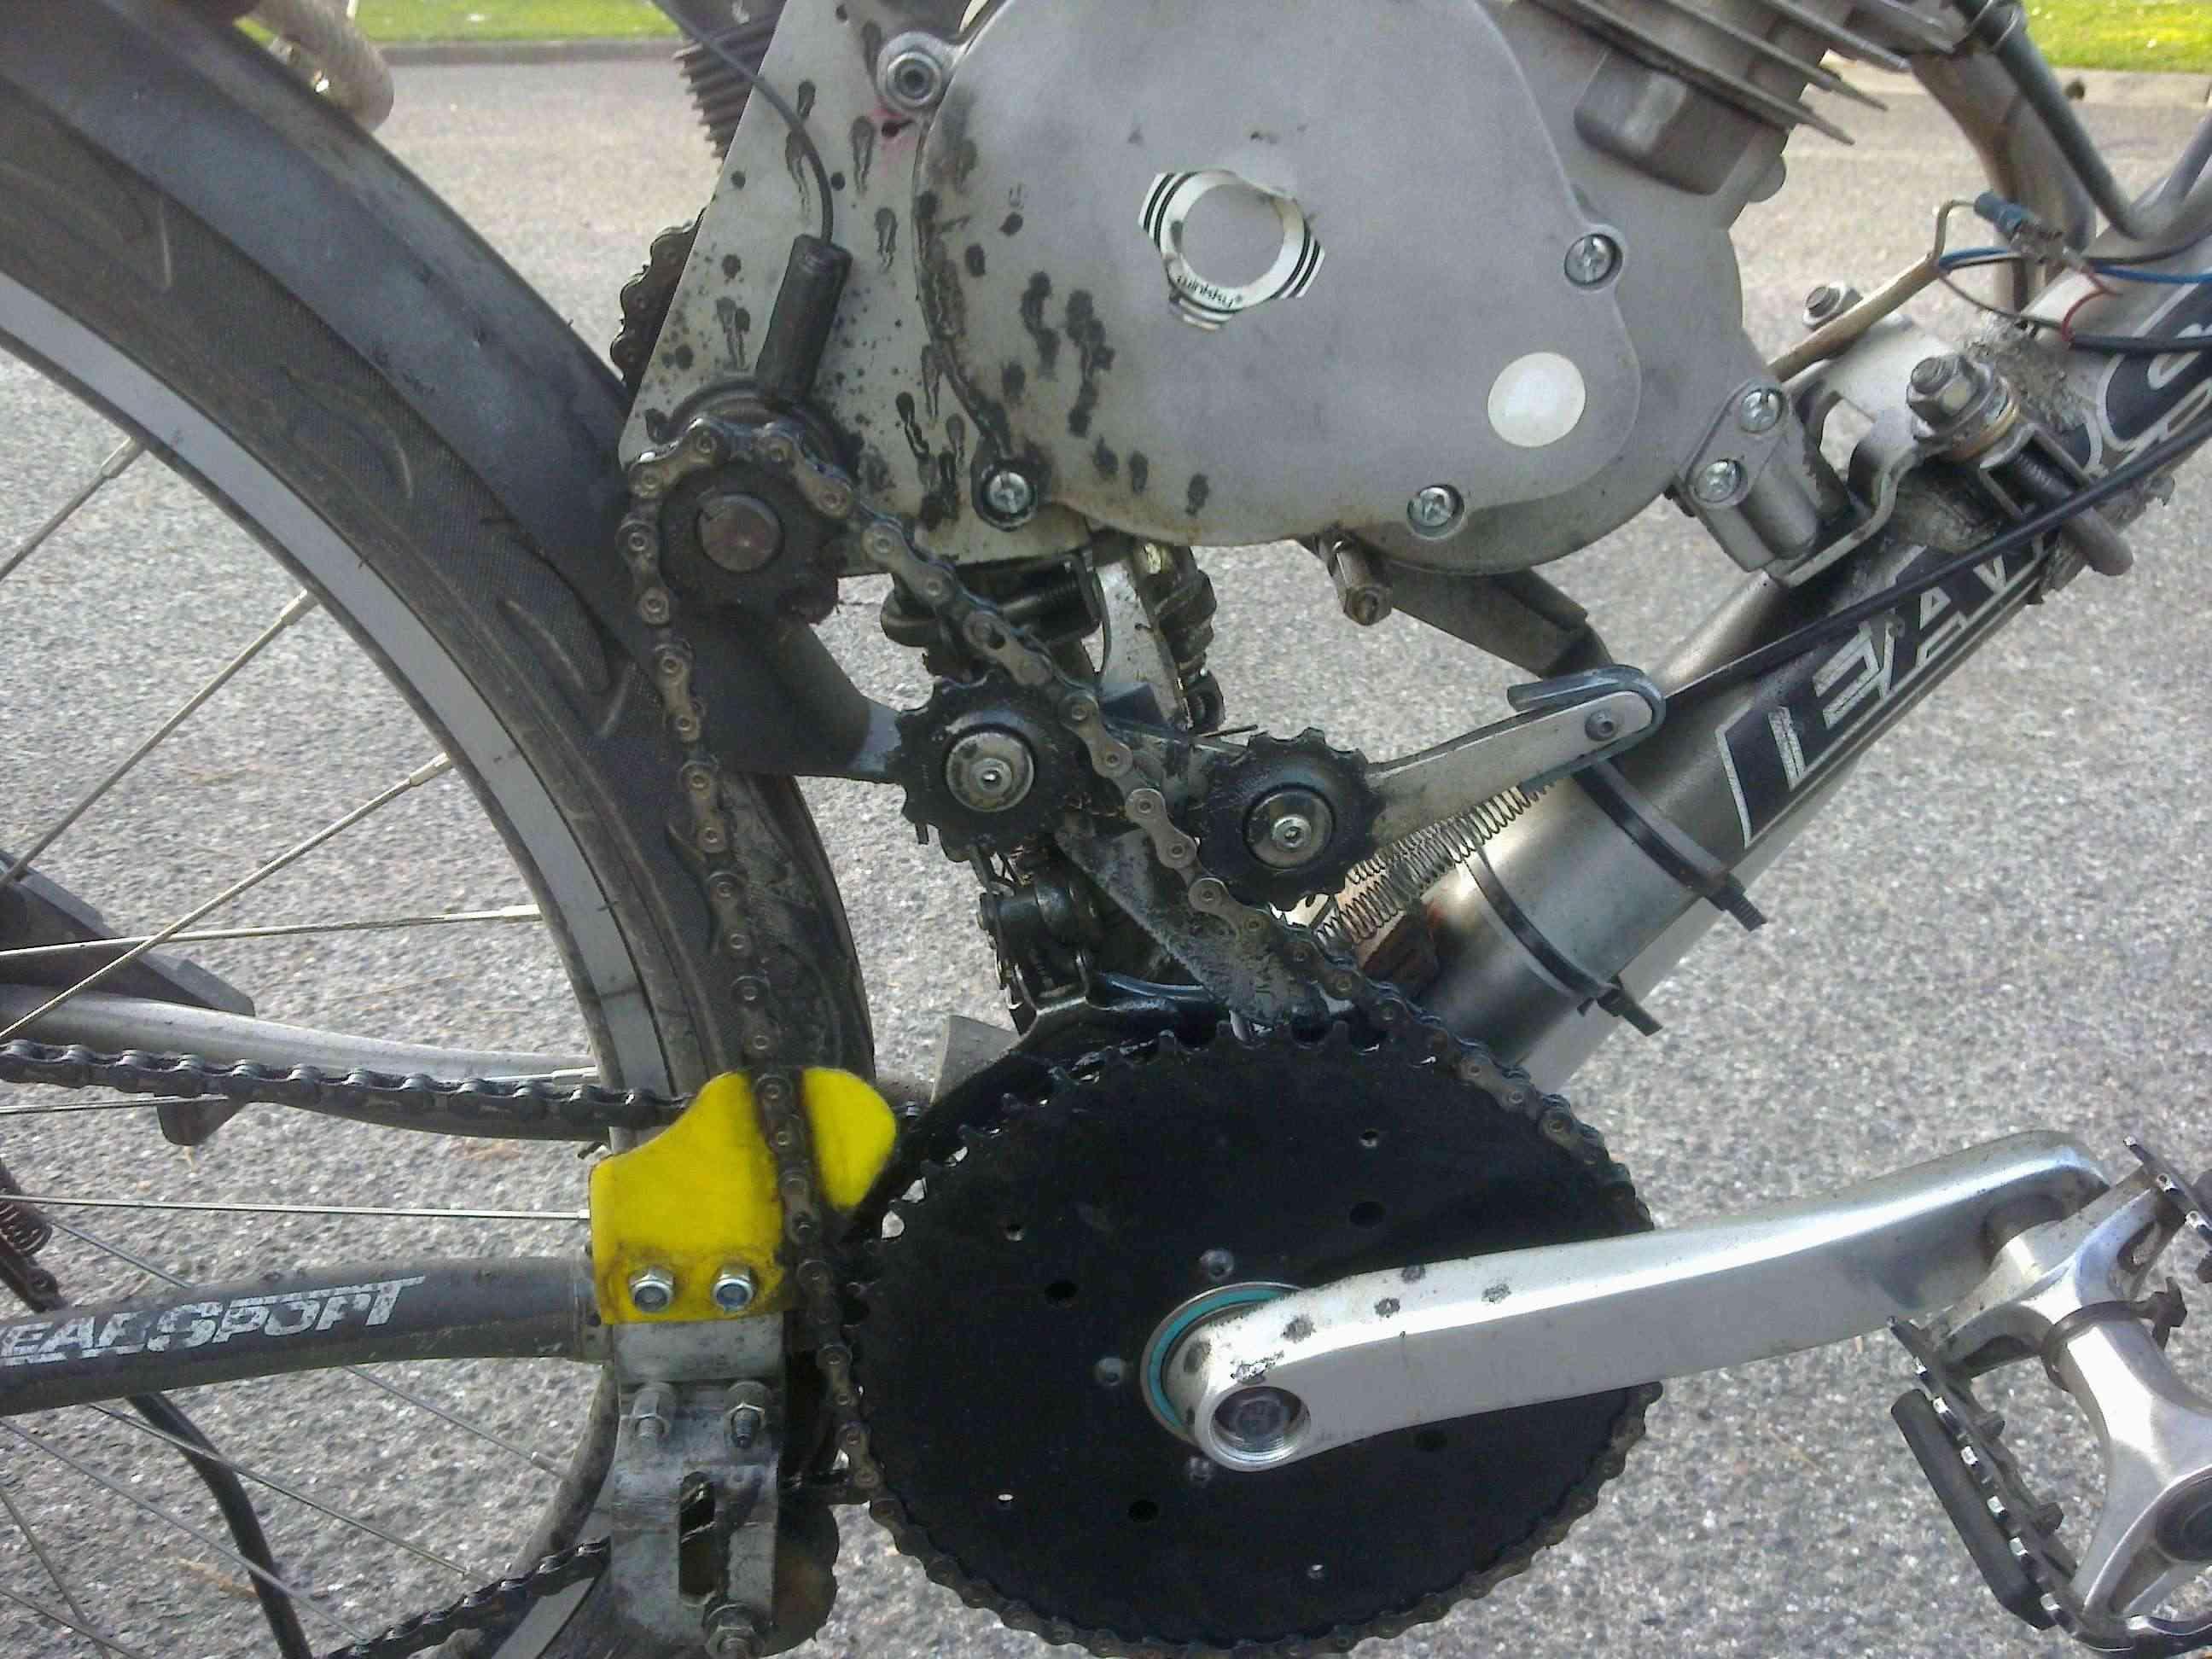 Tetra Chainwheel system for SickBikeparts (Sick Bike Parts, SBP) shift kit 30062010